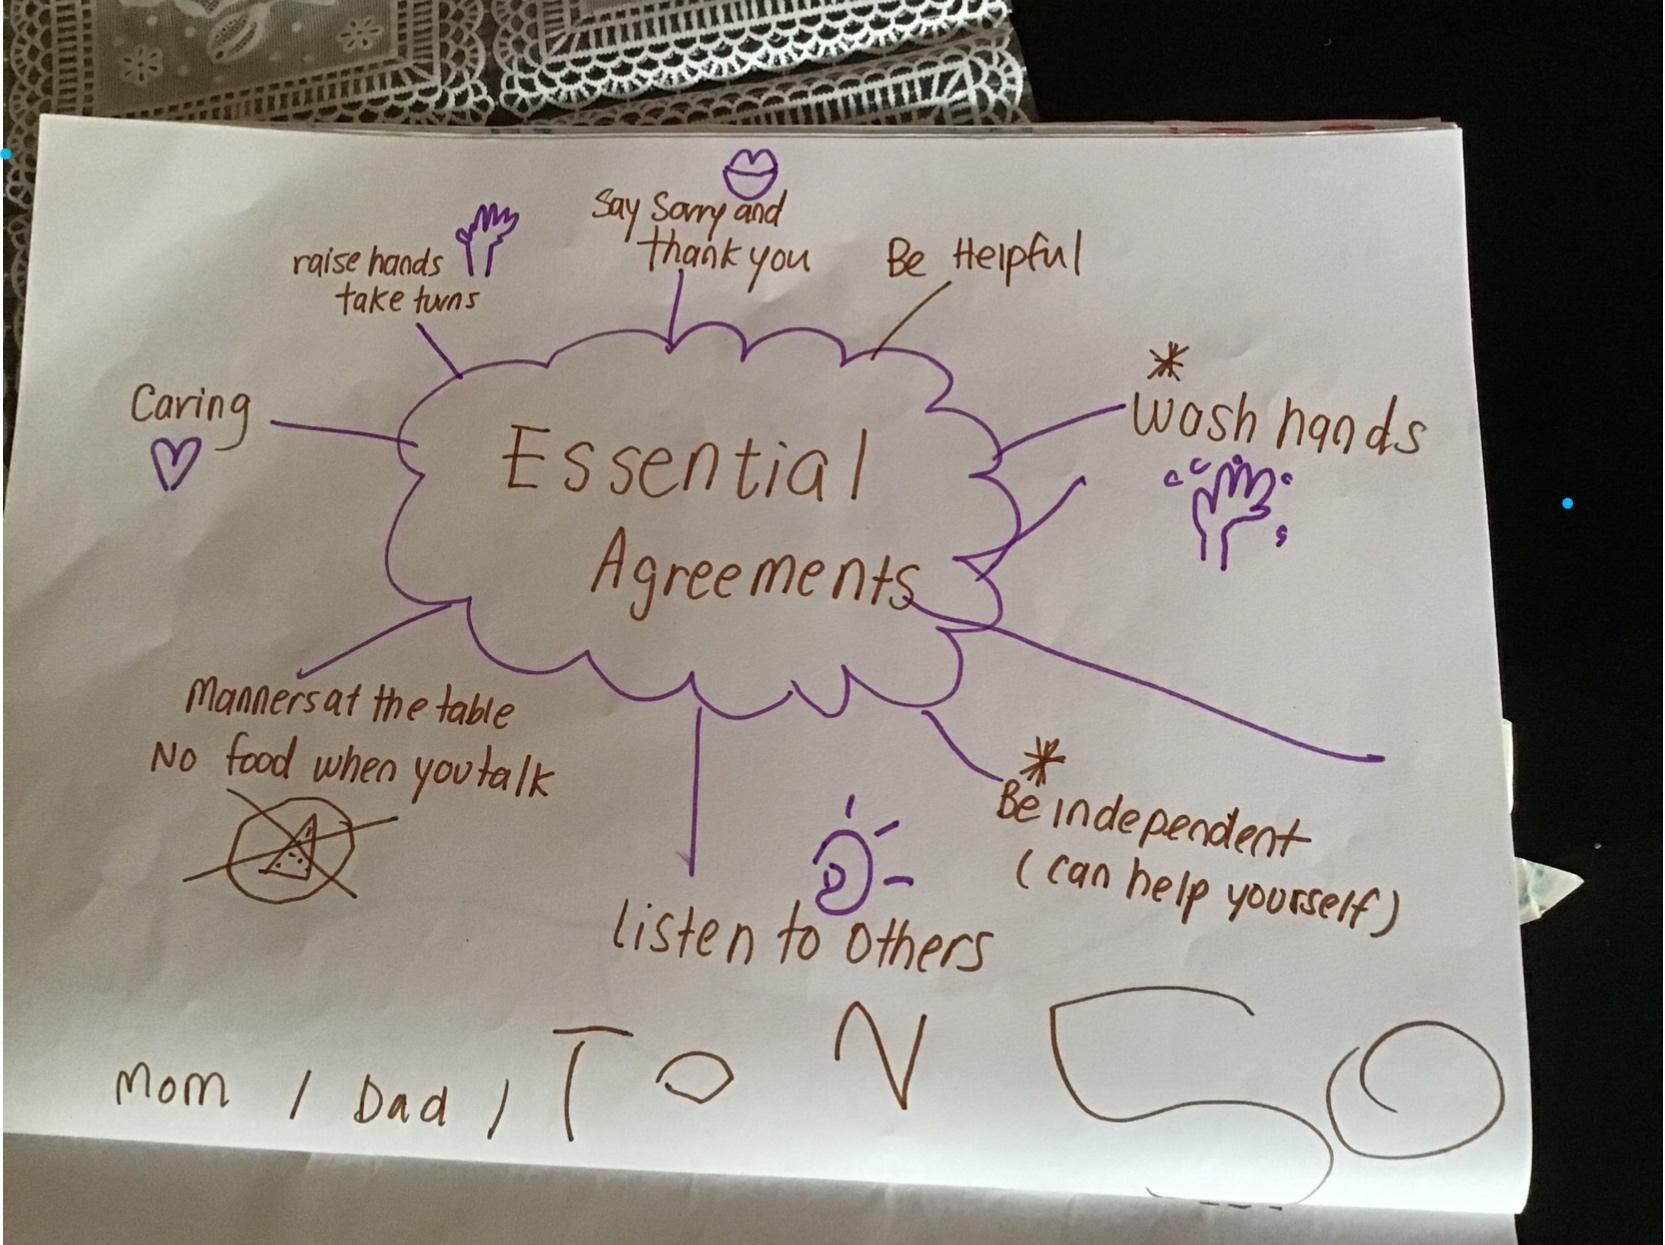 essential agreement 5